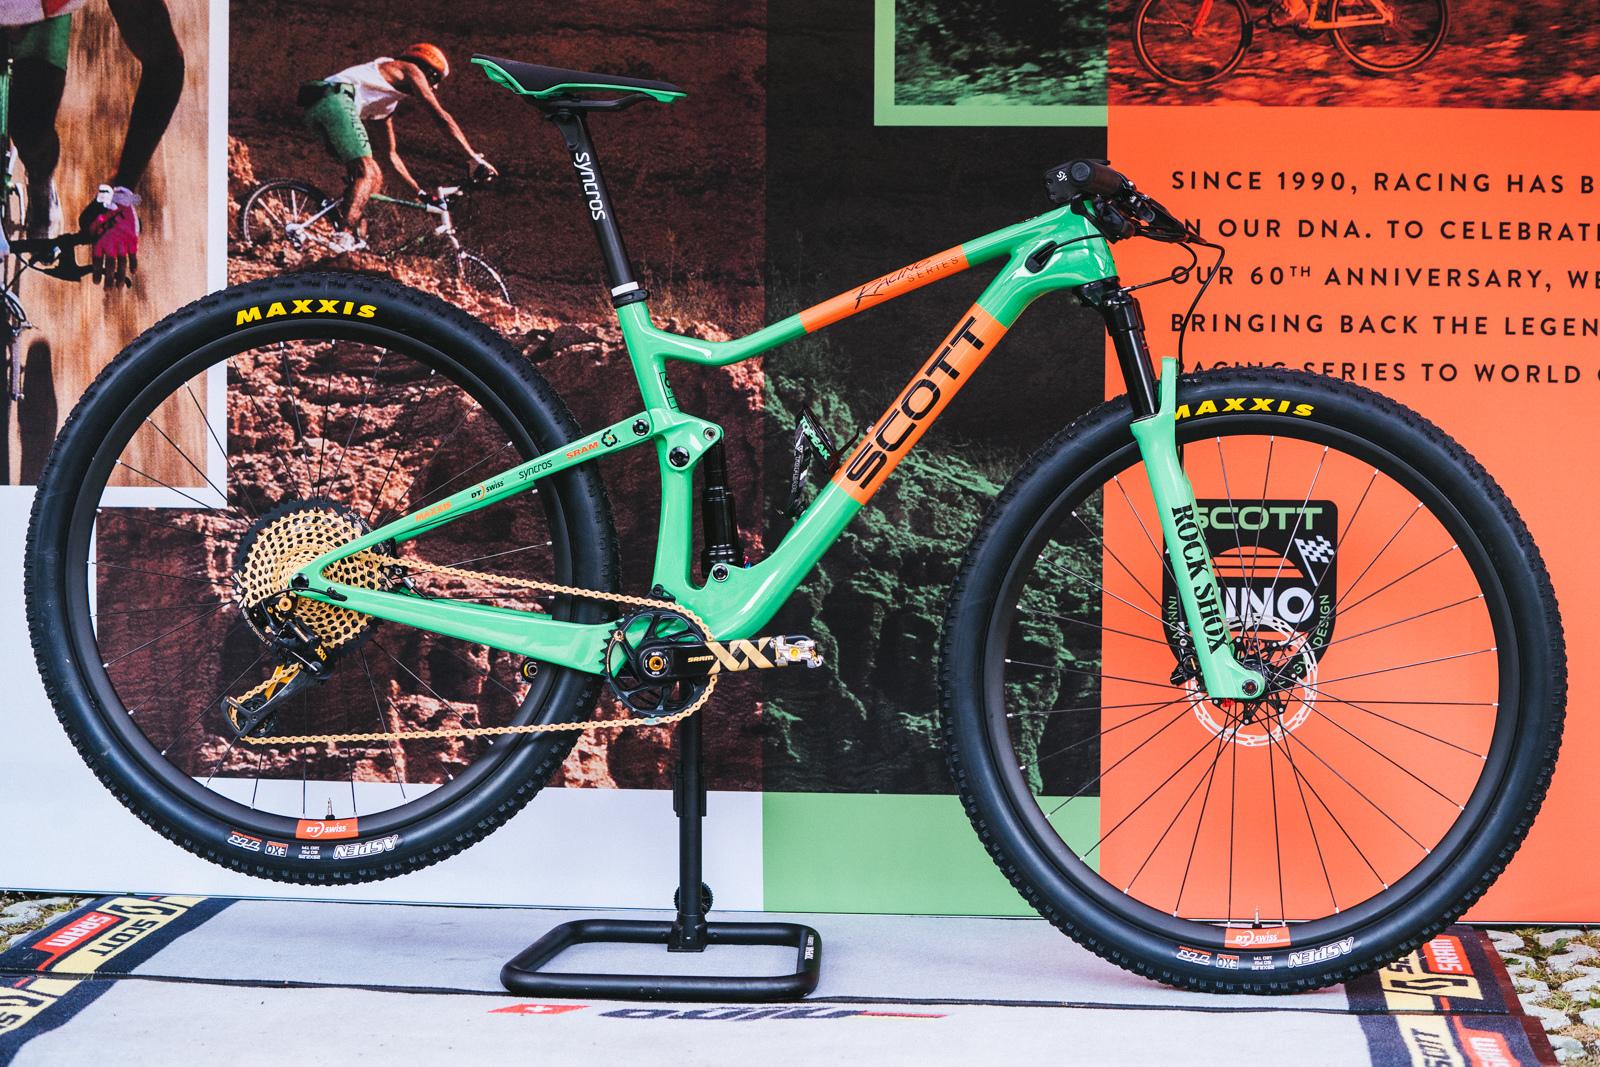 Nino Schurter bike check